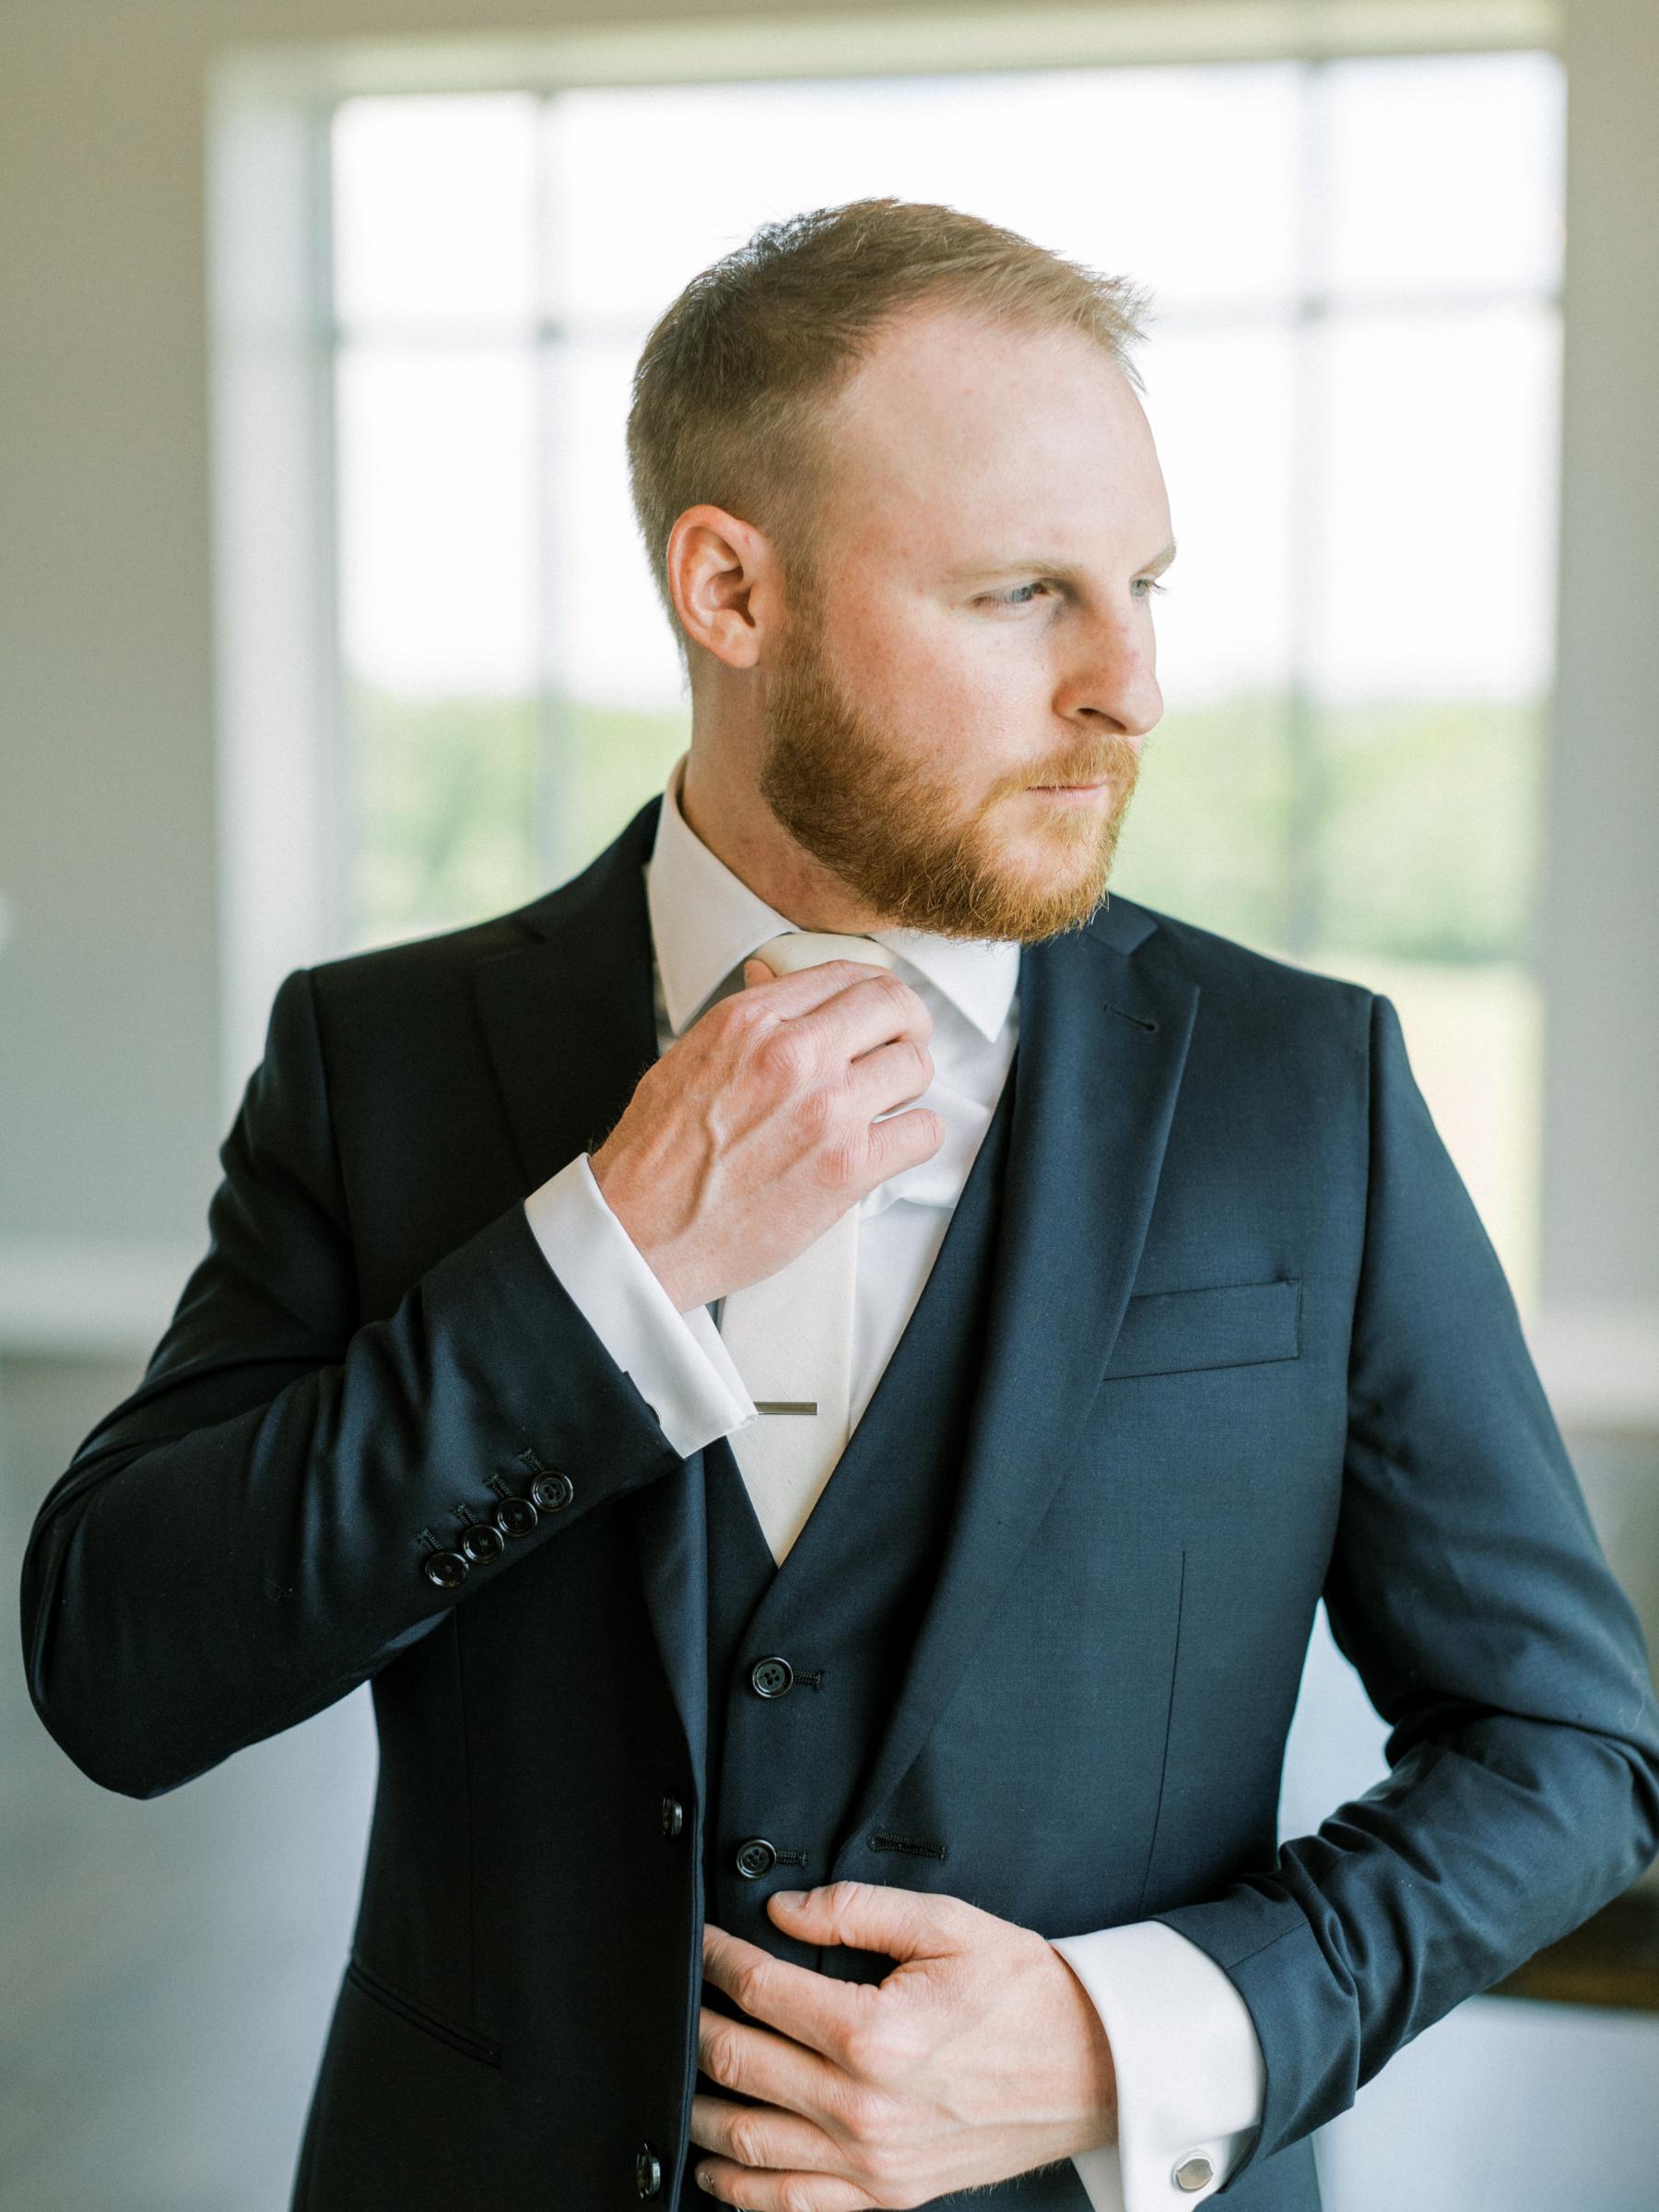 The Black Tux wedding tuxedo